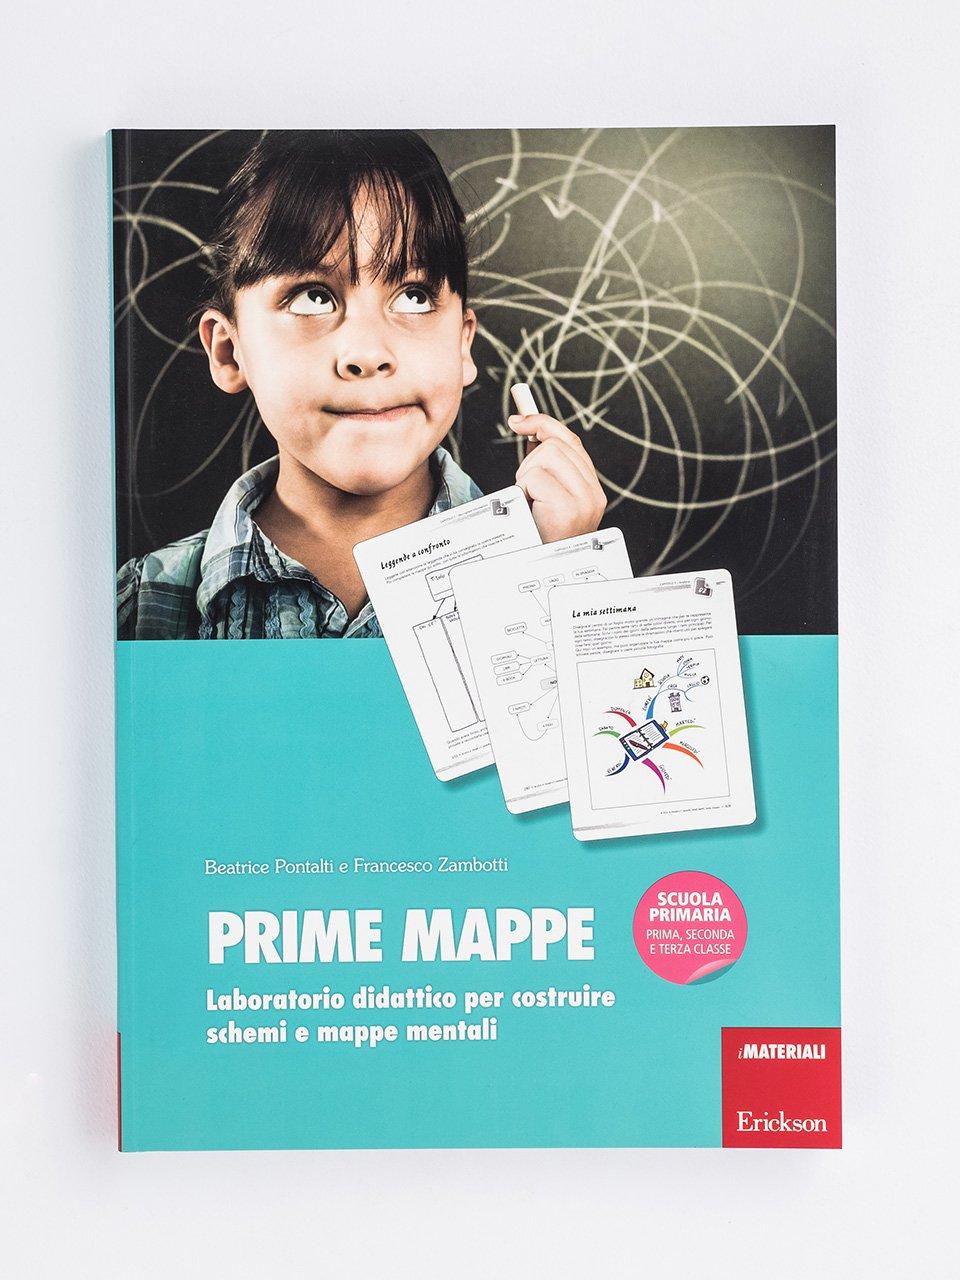 PRIME MAPPE - IperMAPPE 2 - App e software - Erickson